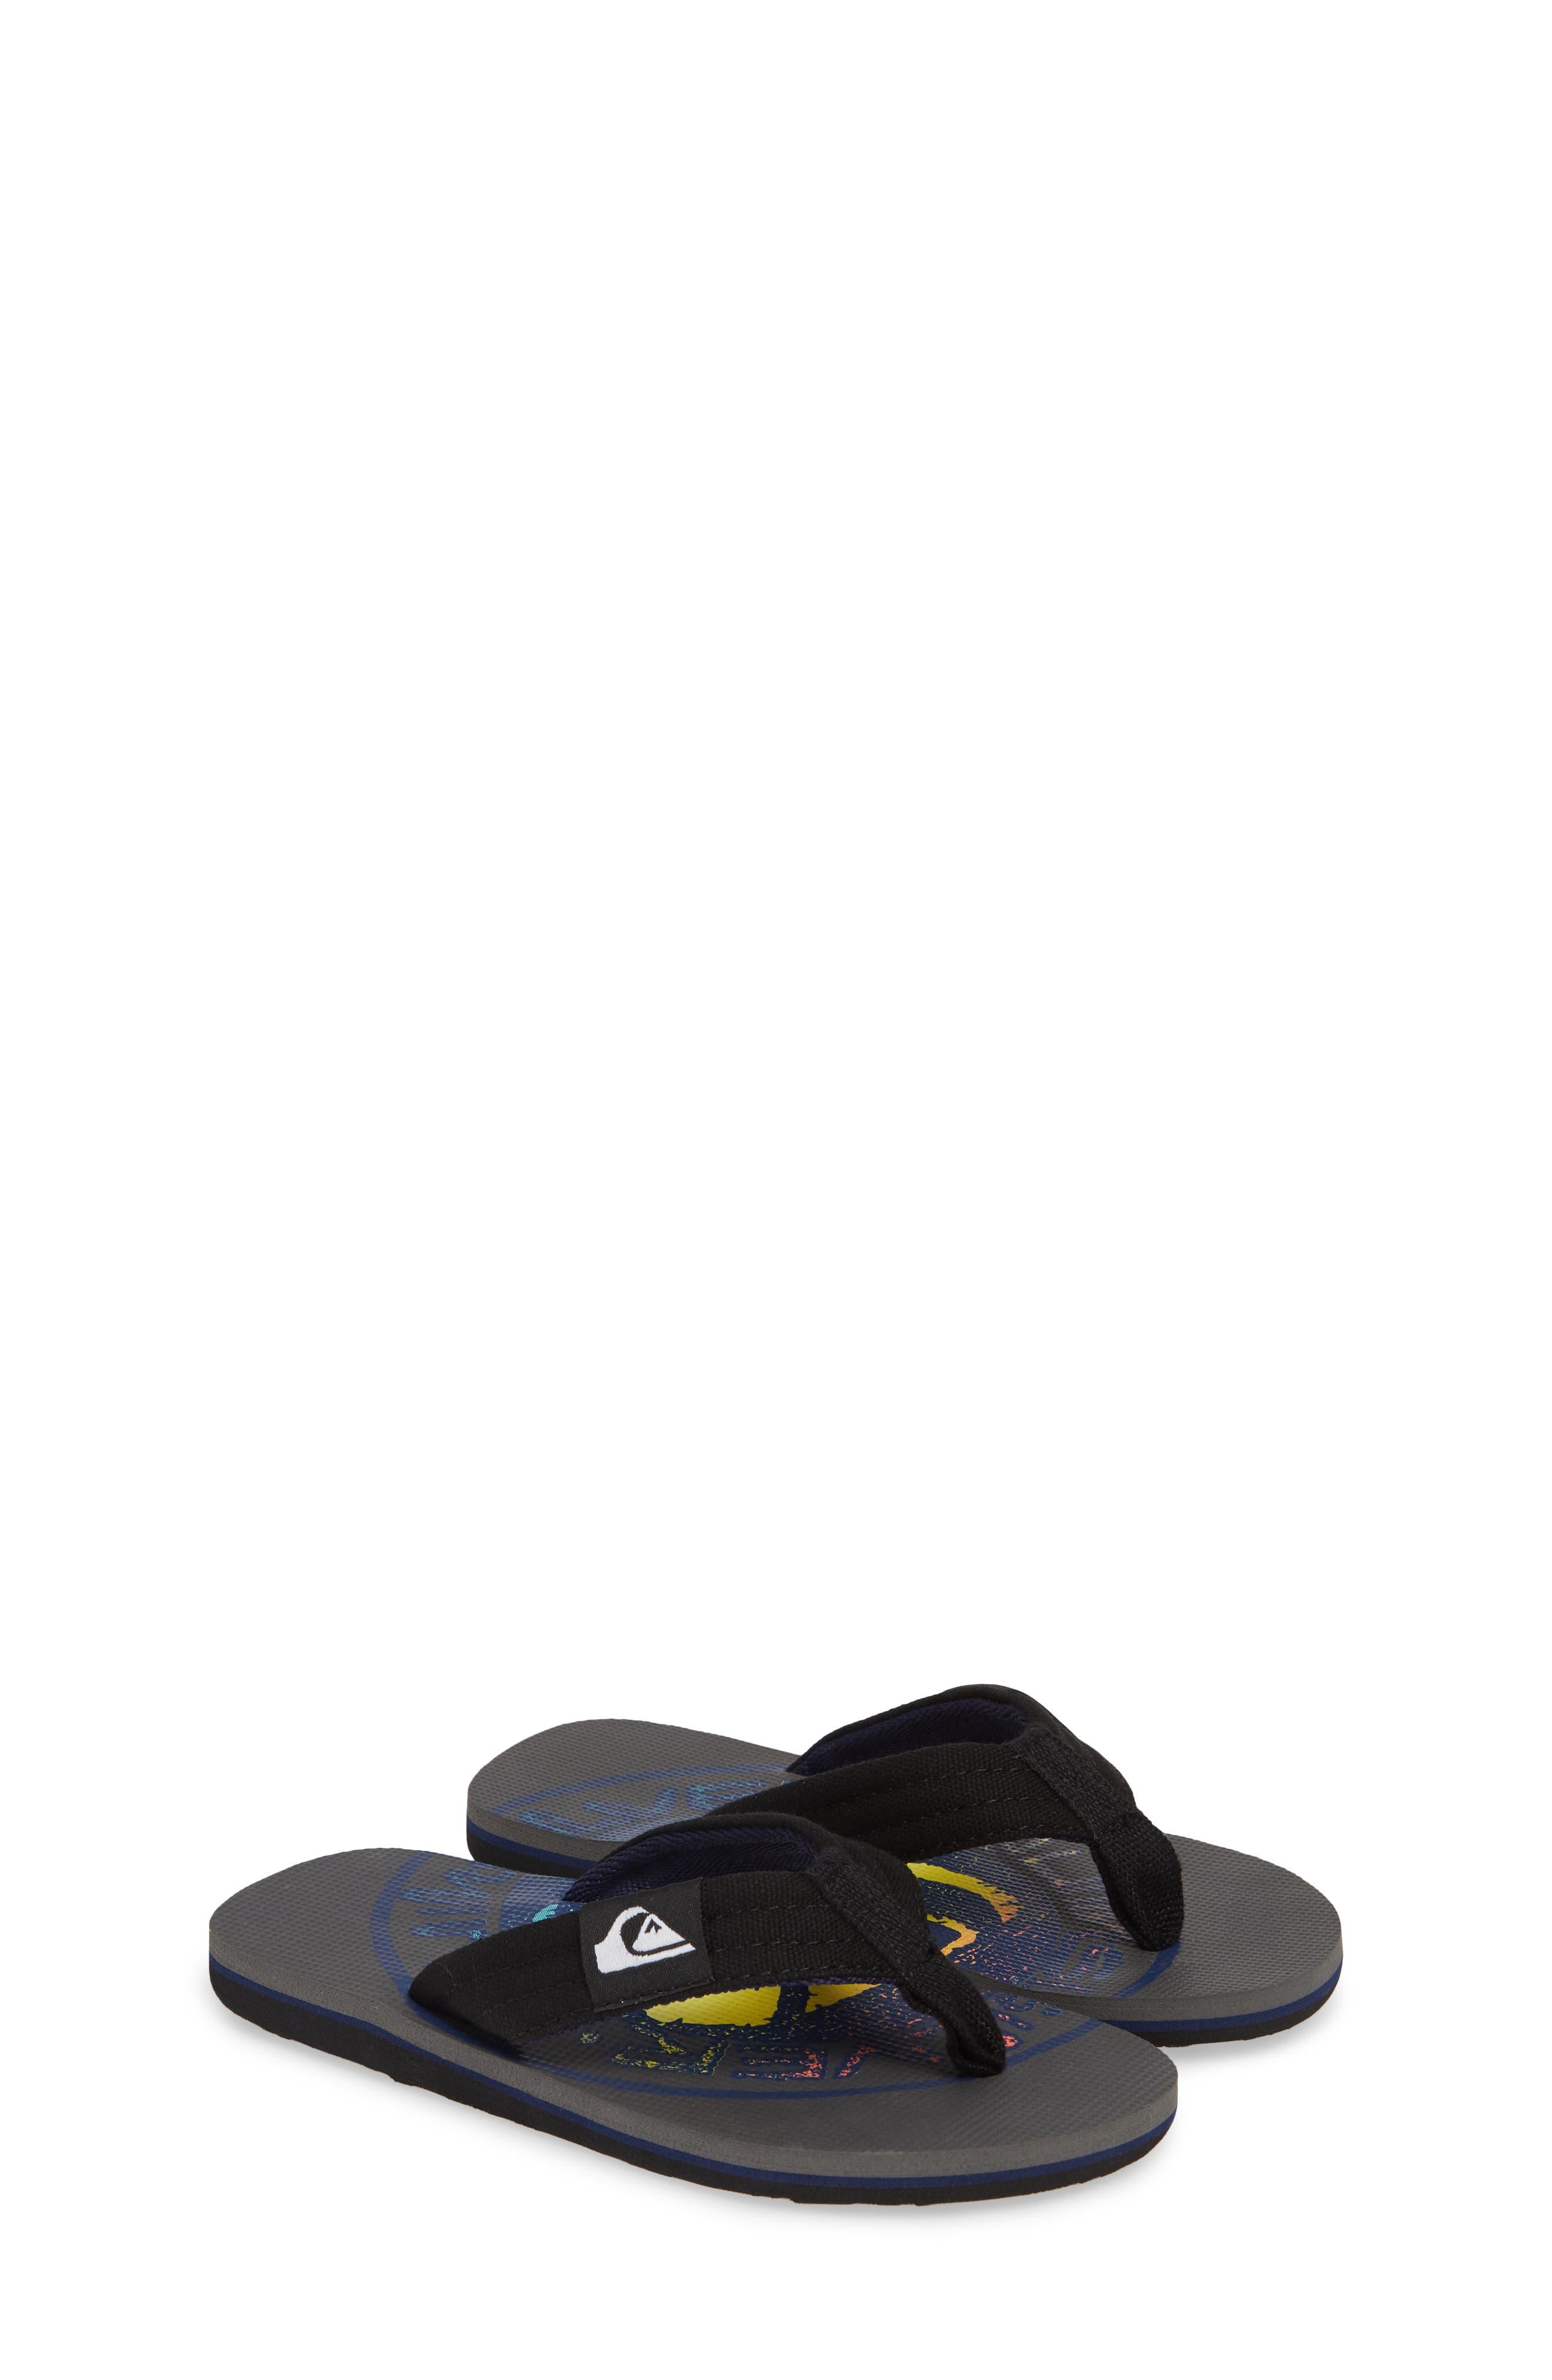 QUIKSILVER, Molokai Layback Flip Flop, Alternate thumbnail 2, color, GREY/ BLACK/ BLUE